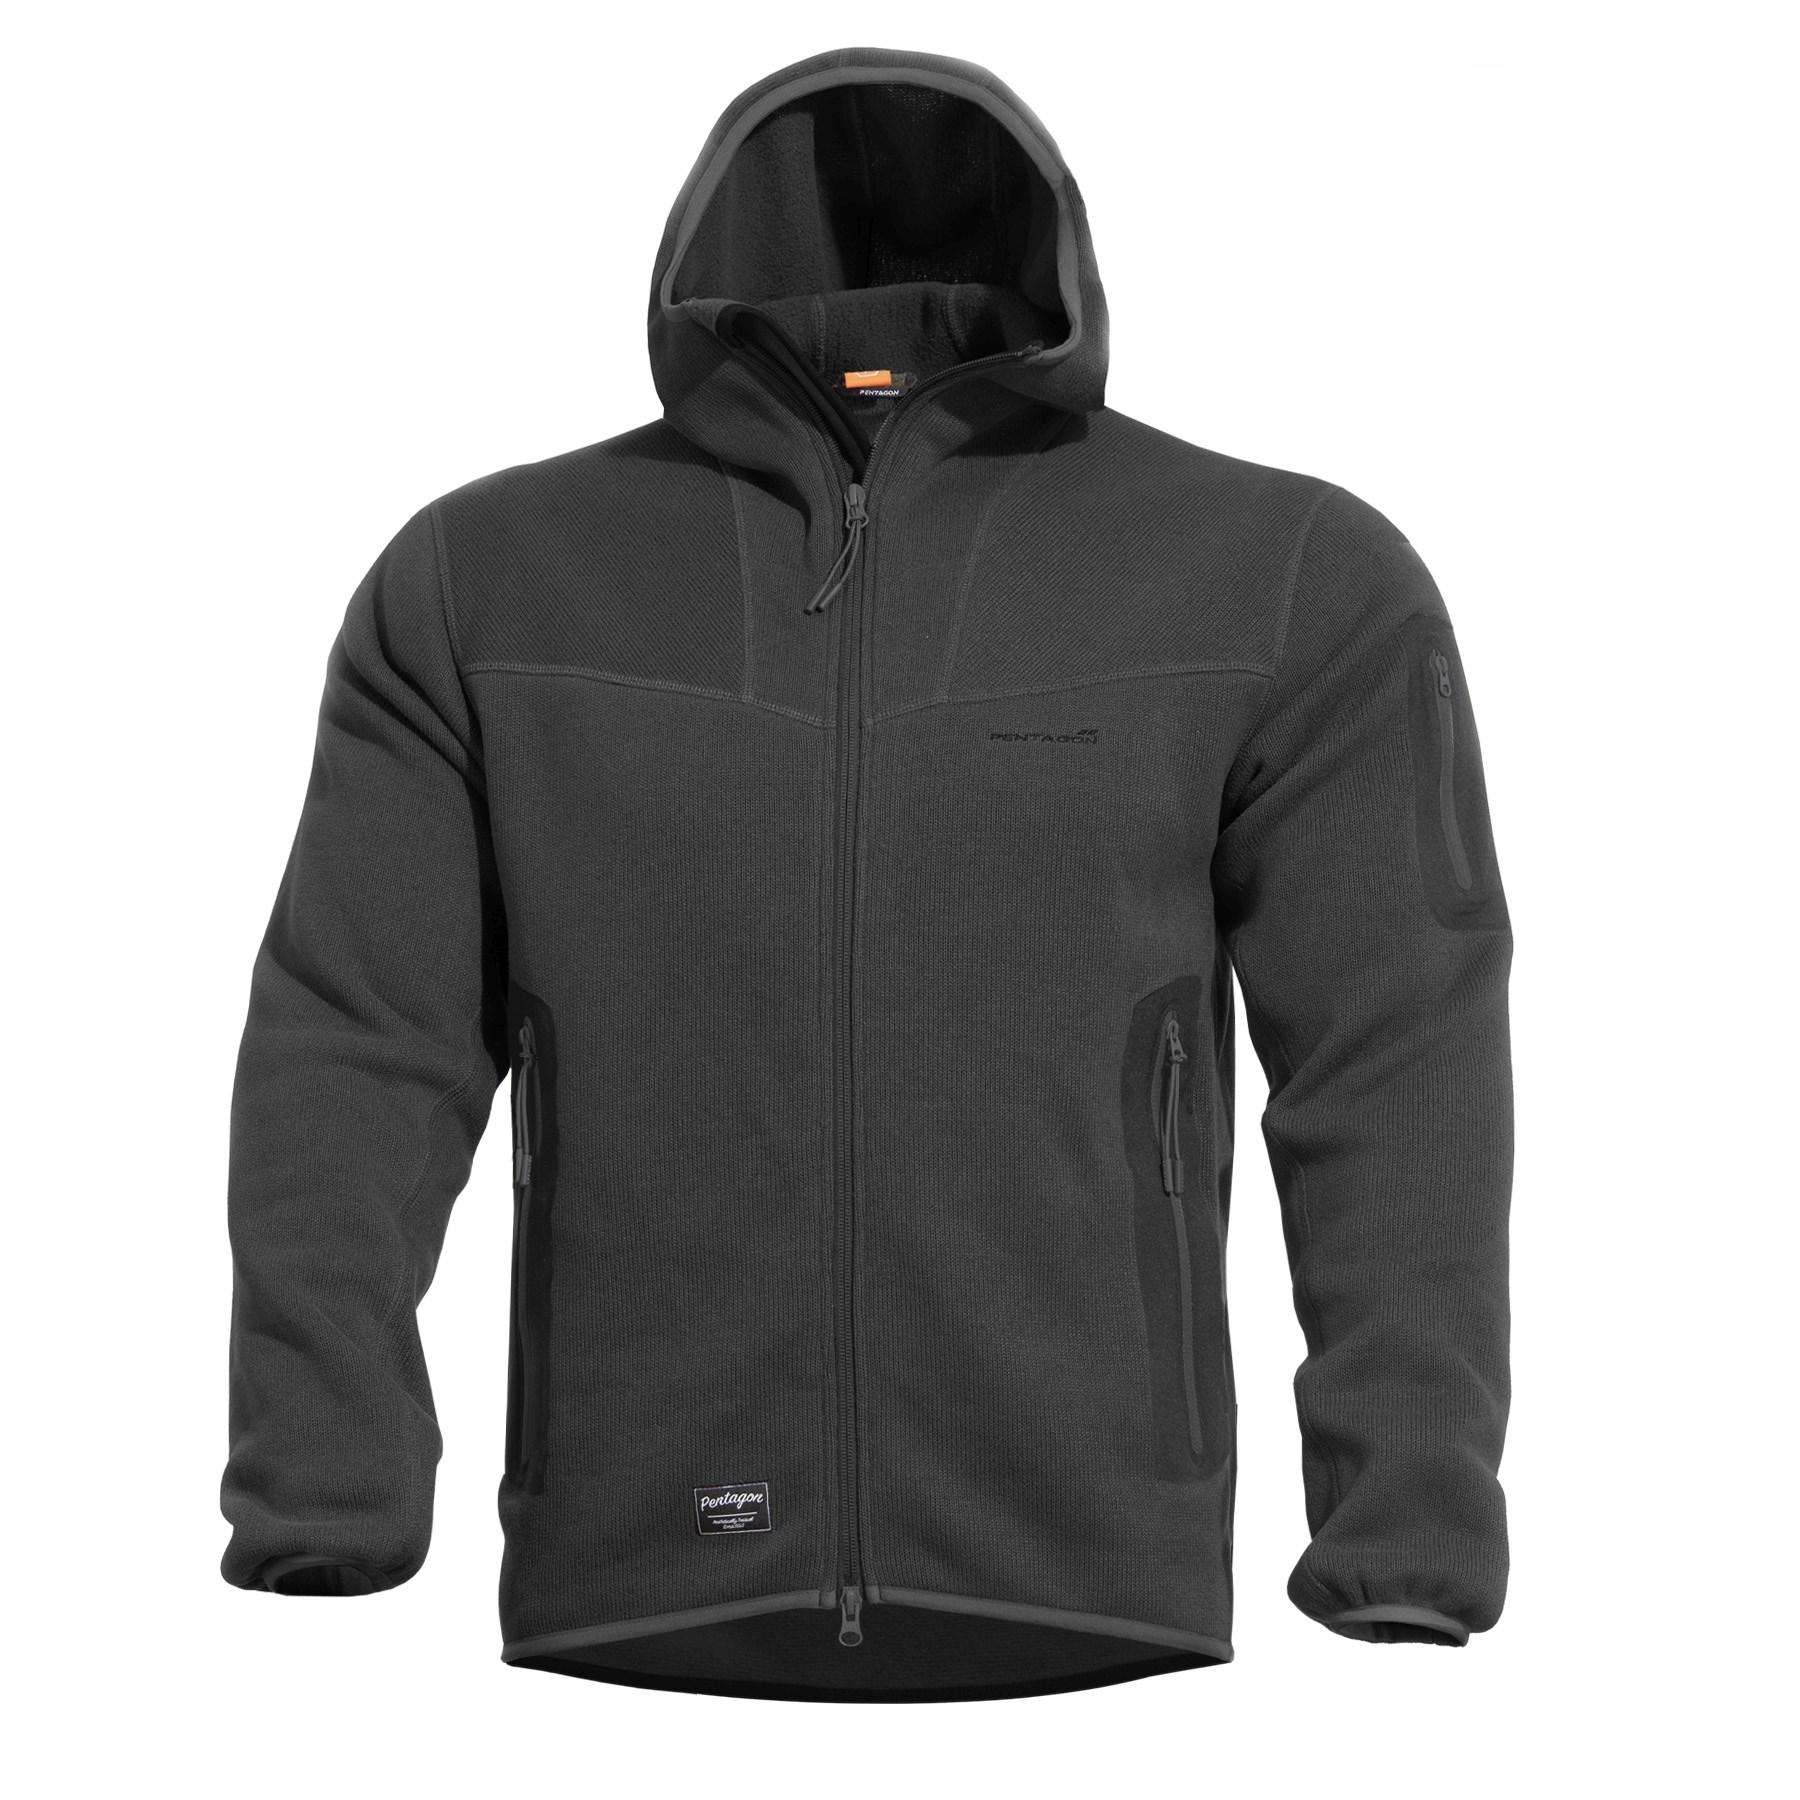 Falcon Pro Sweater BLACK PENTAGON K08036-01 L-11